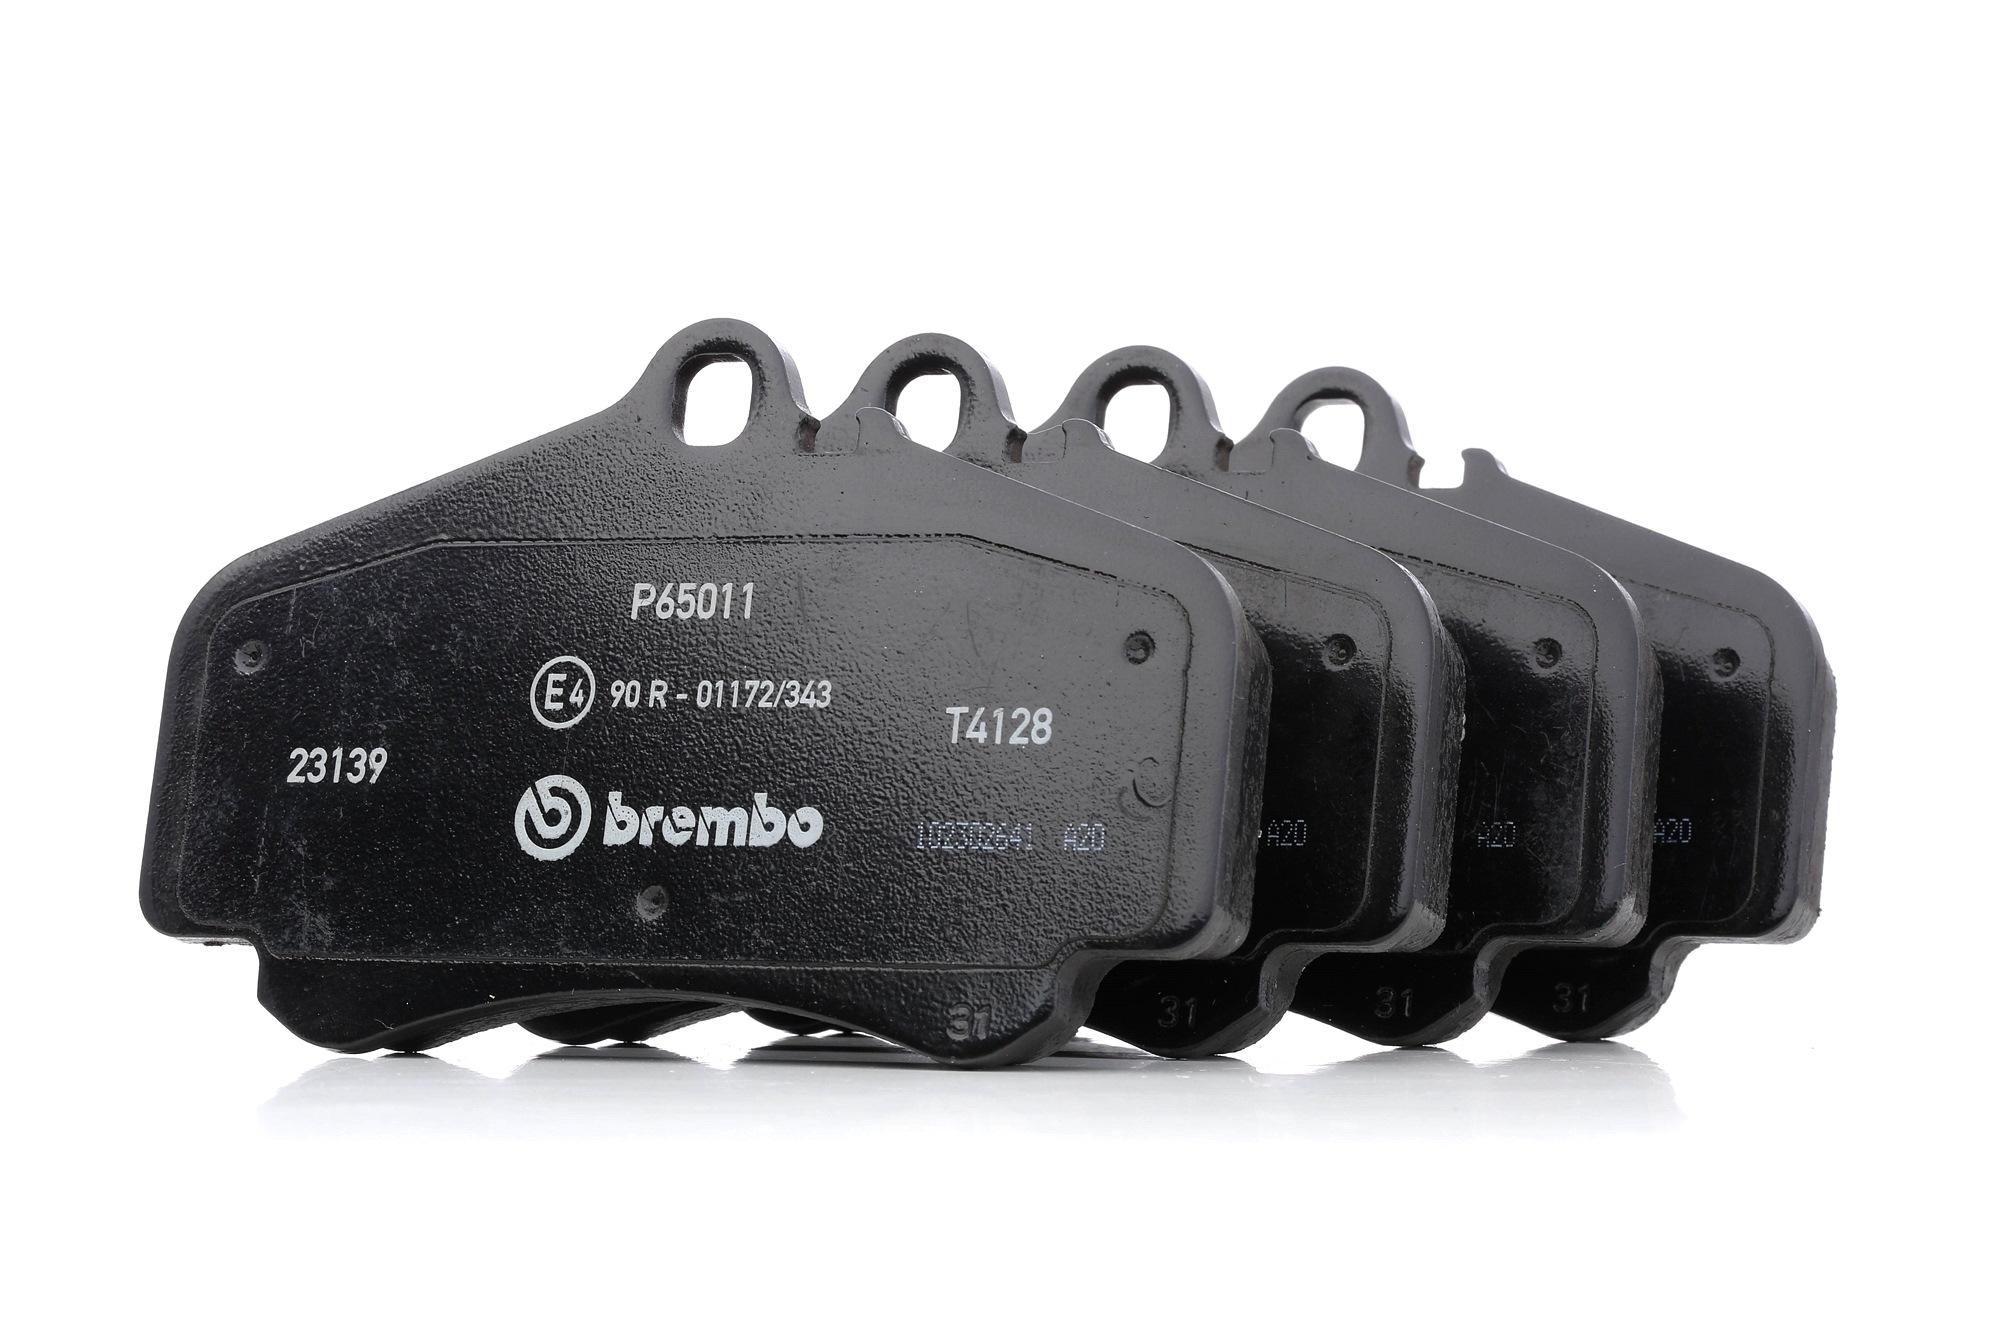 Bremsbelagsatz BREMBO 23330 Bewertung